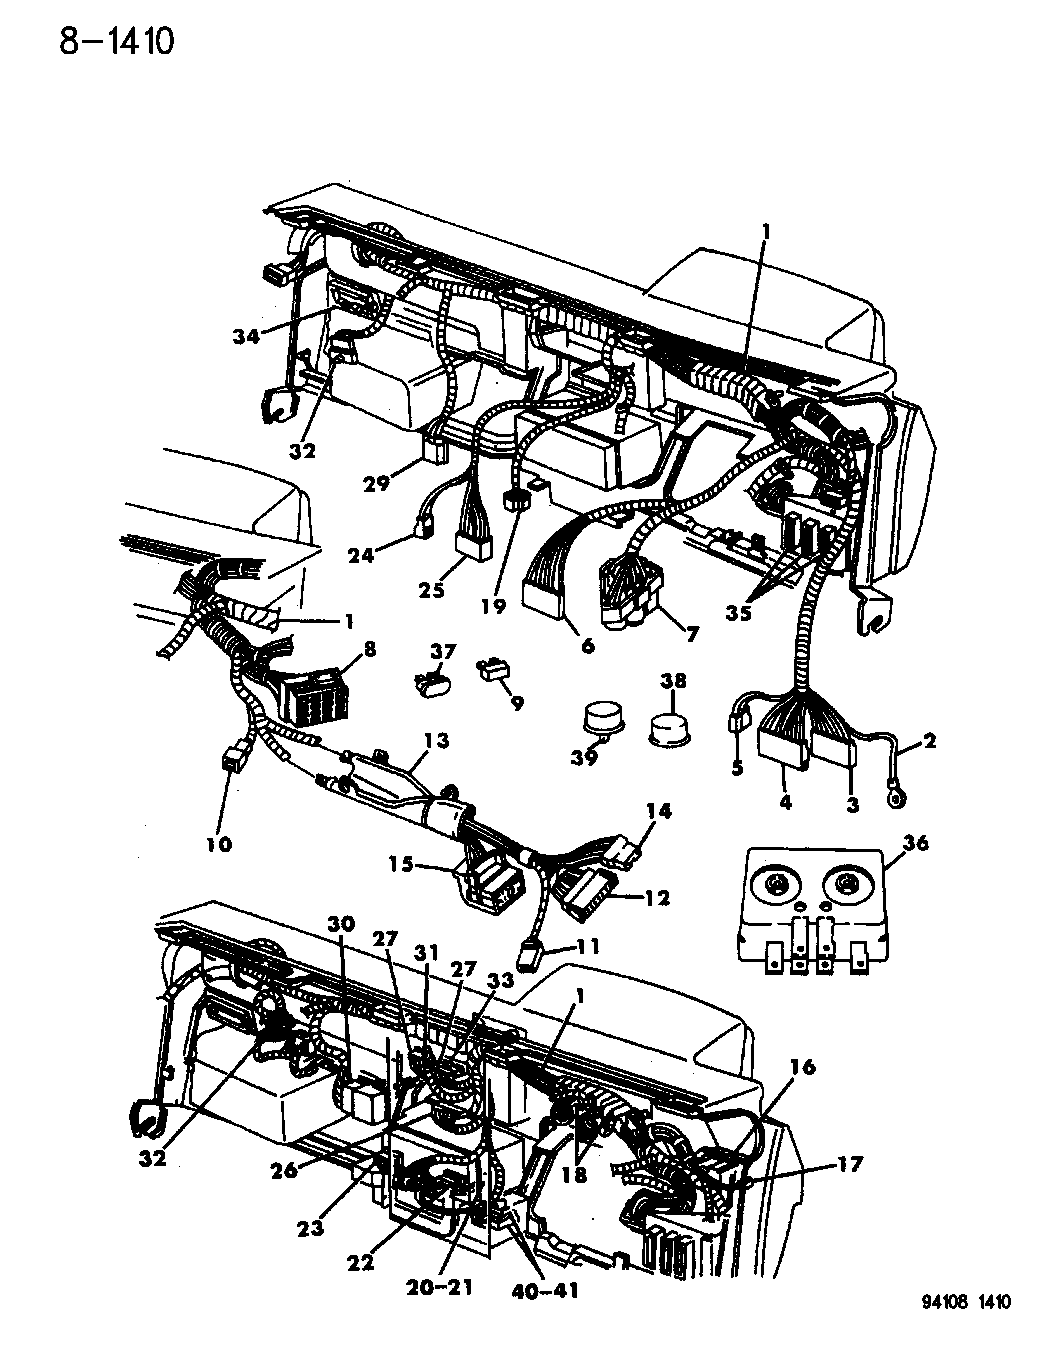 1994 dodge shadow wiring - instrument panel